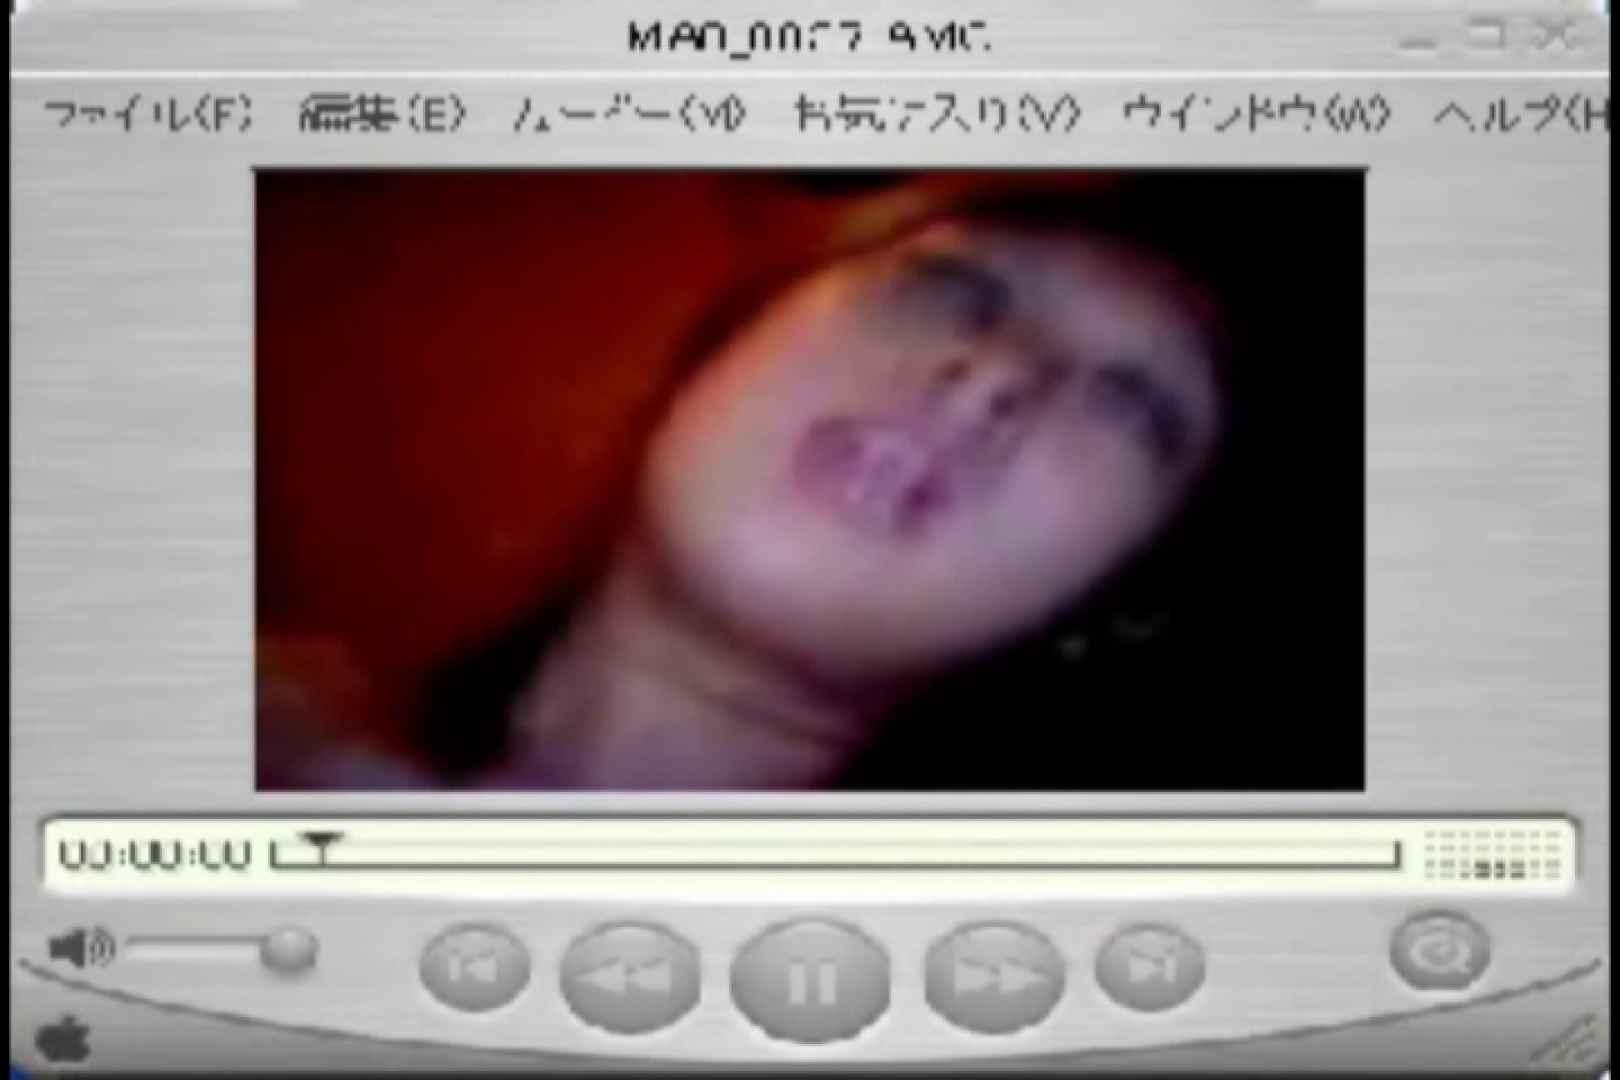 Shigeruのアルバム 流出作品  68pic 64